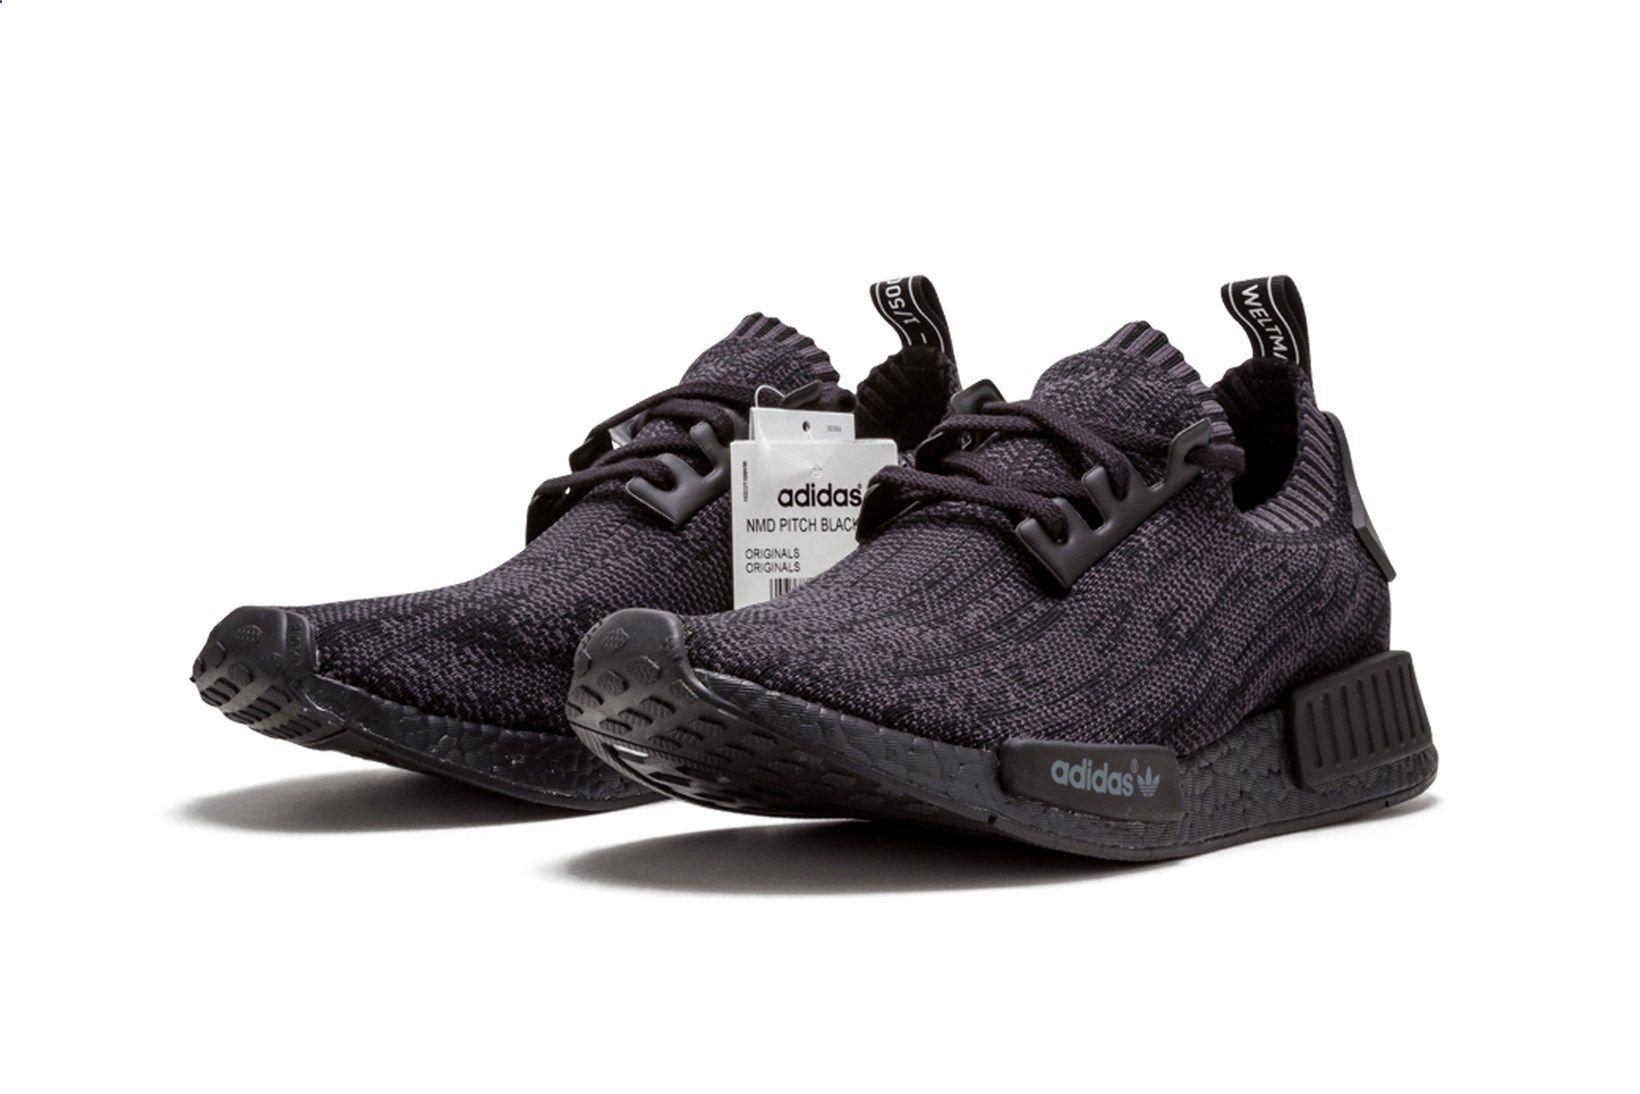 Nike adidas YEEZY Kobe NMD